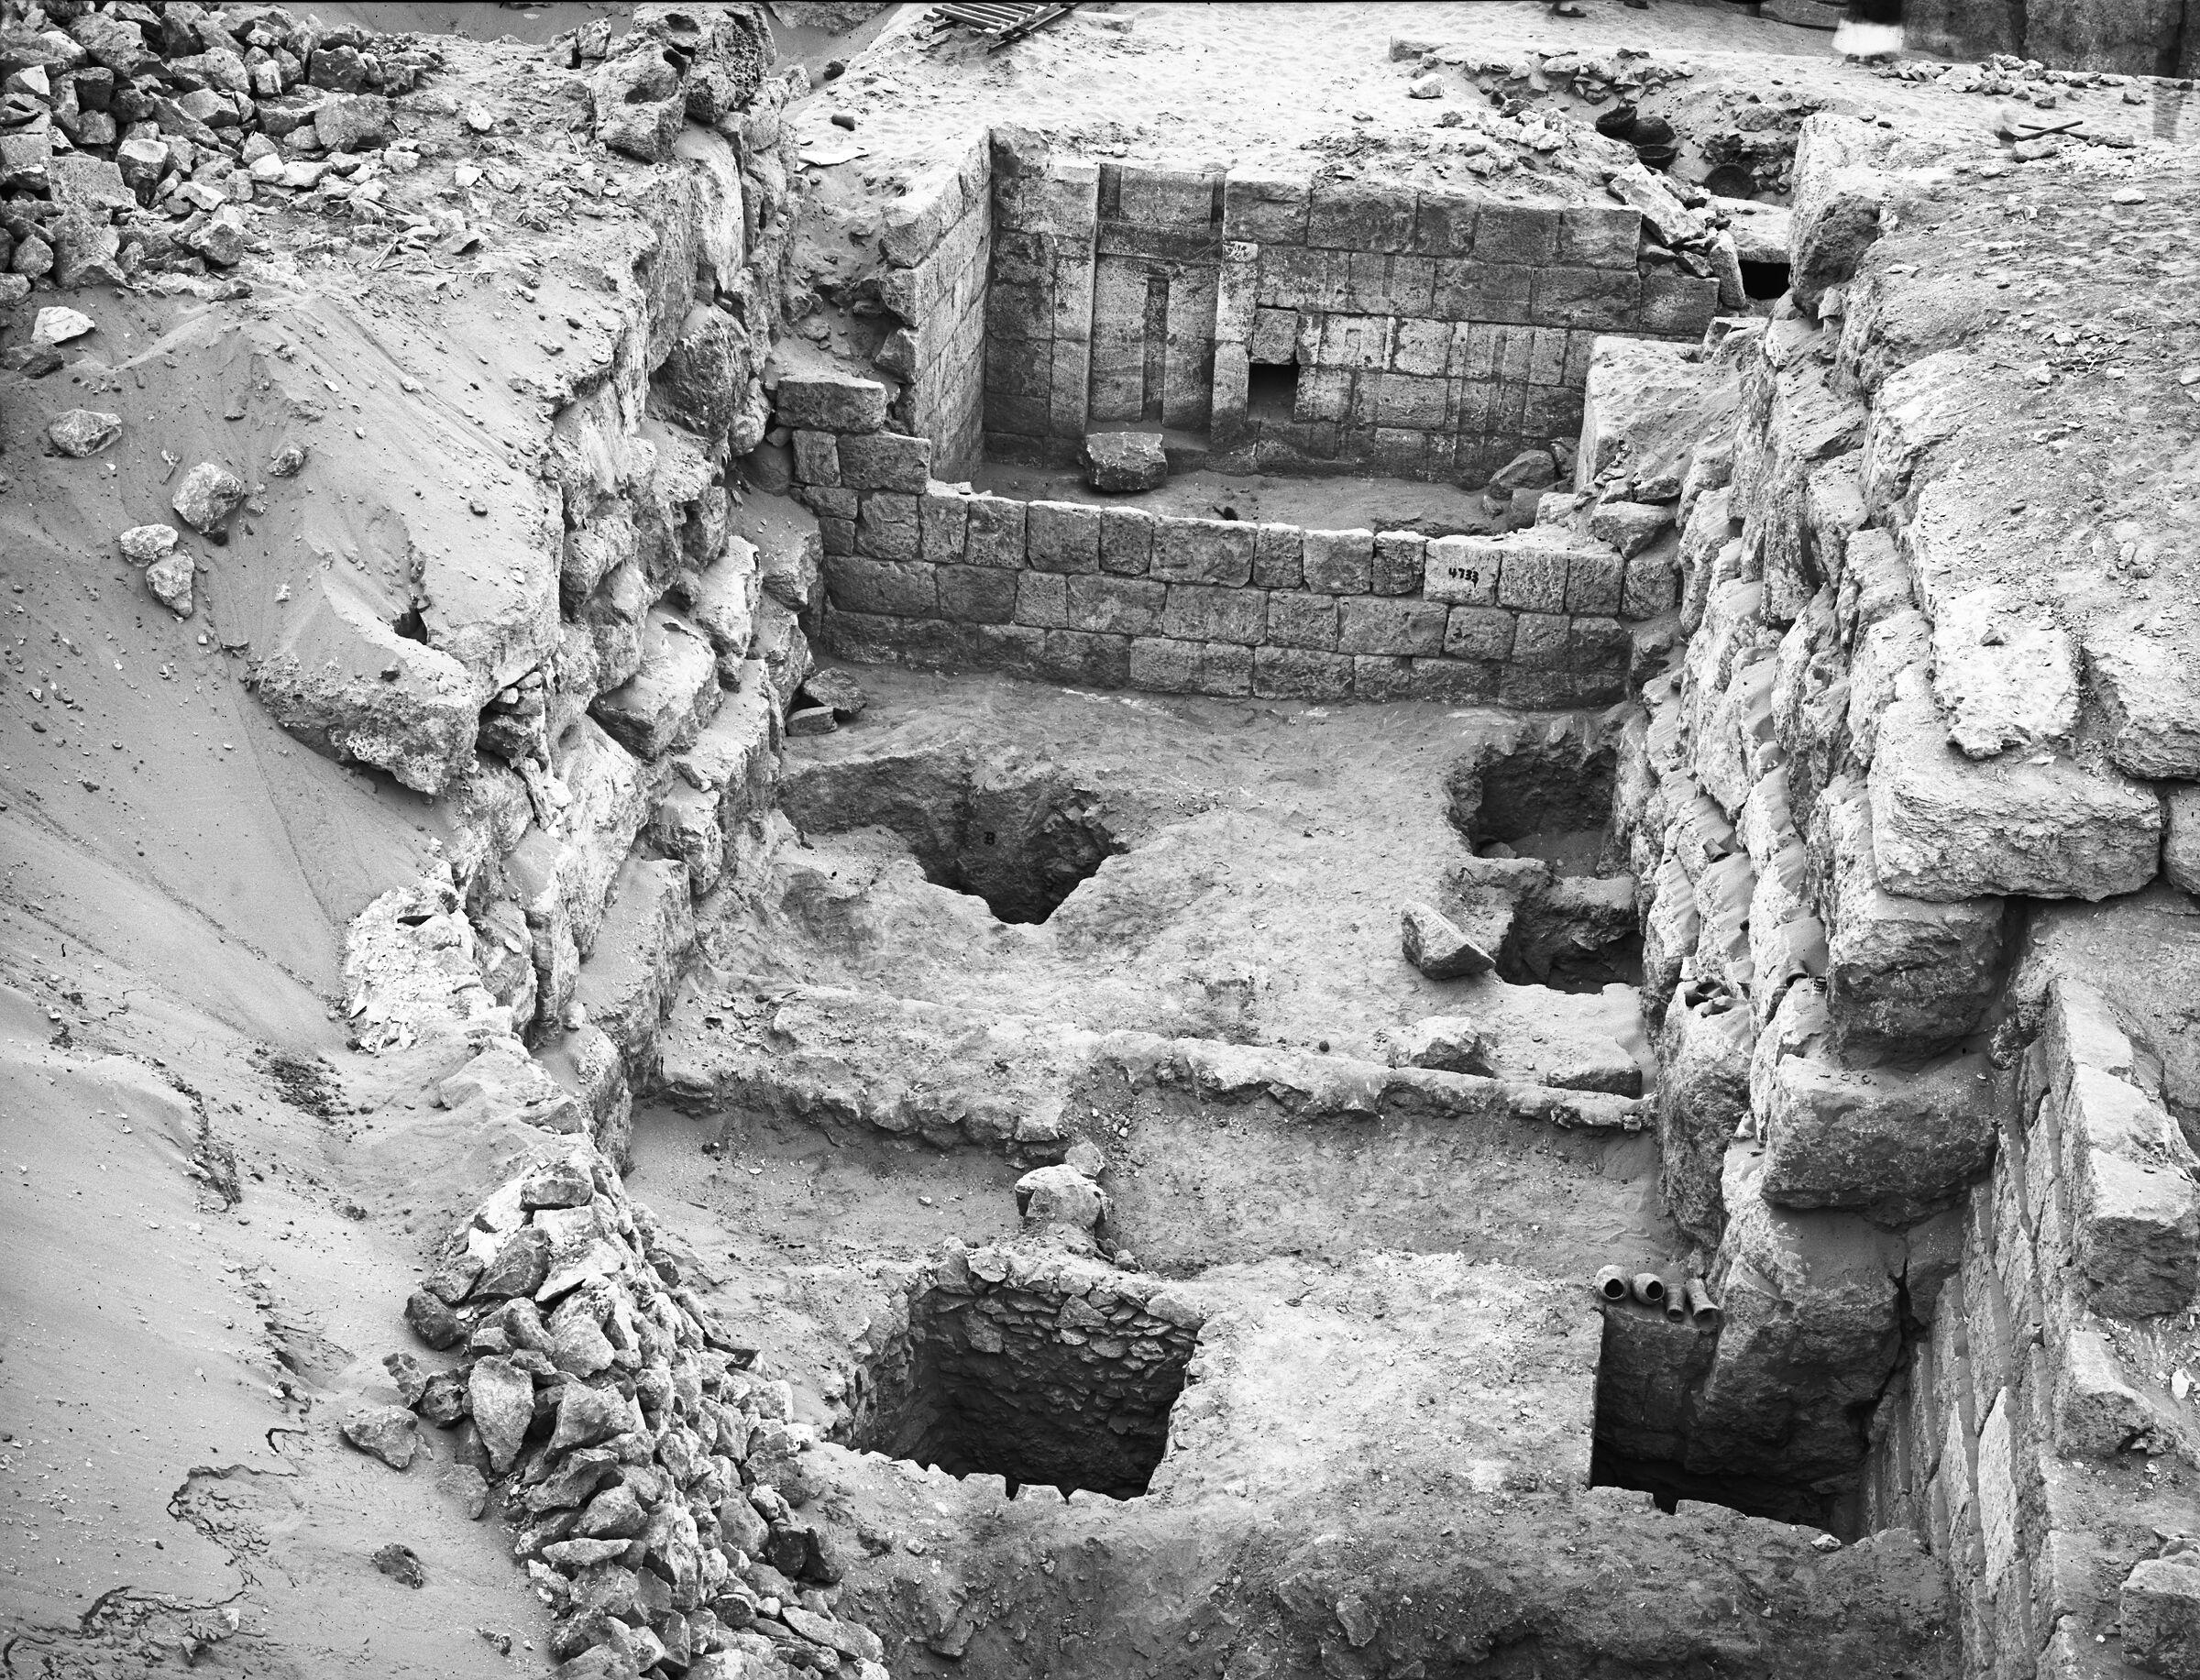 Western Cemetery: Site: Giza; View: G 4830, G 4820, G 4821, G 4822, G 4733